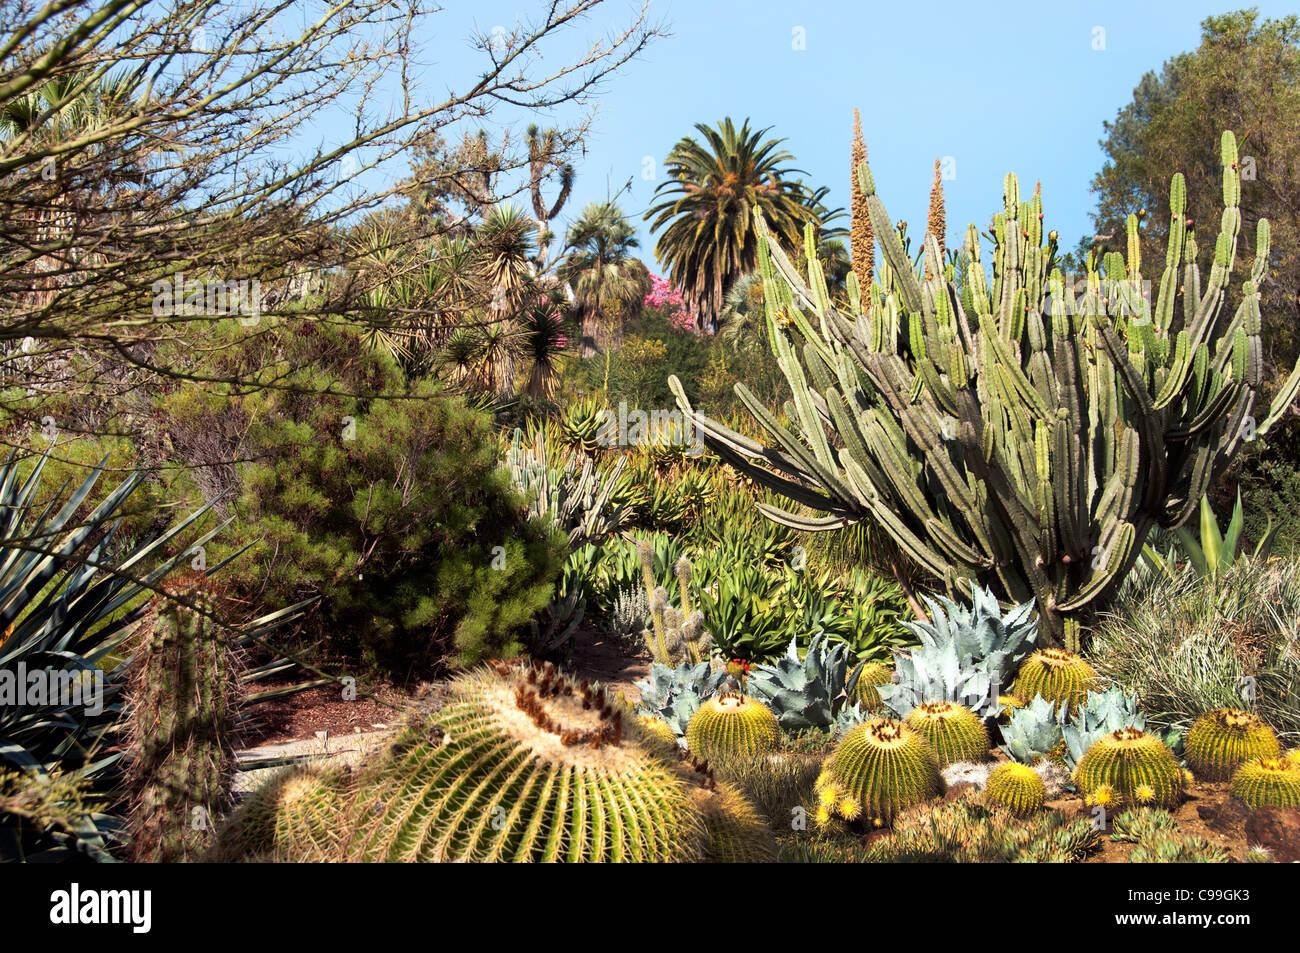 Globe Cactus Stock Photos & Globe Cactus Stock Images - Alamy